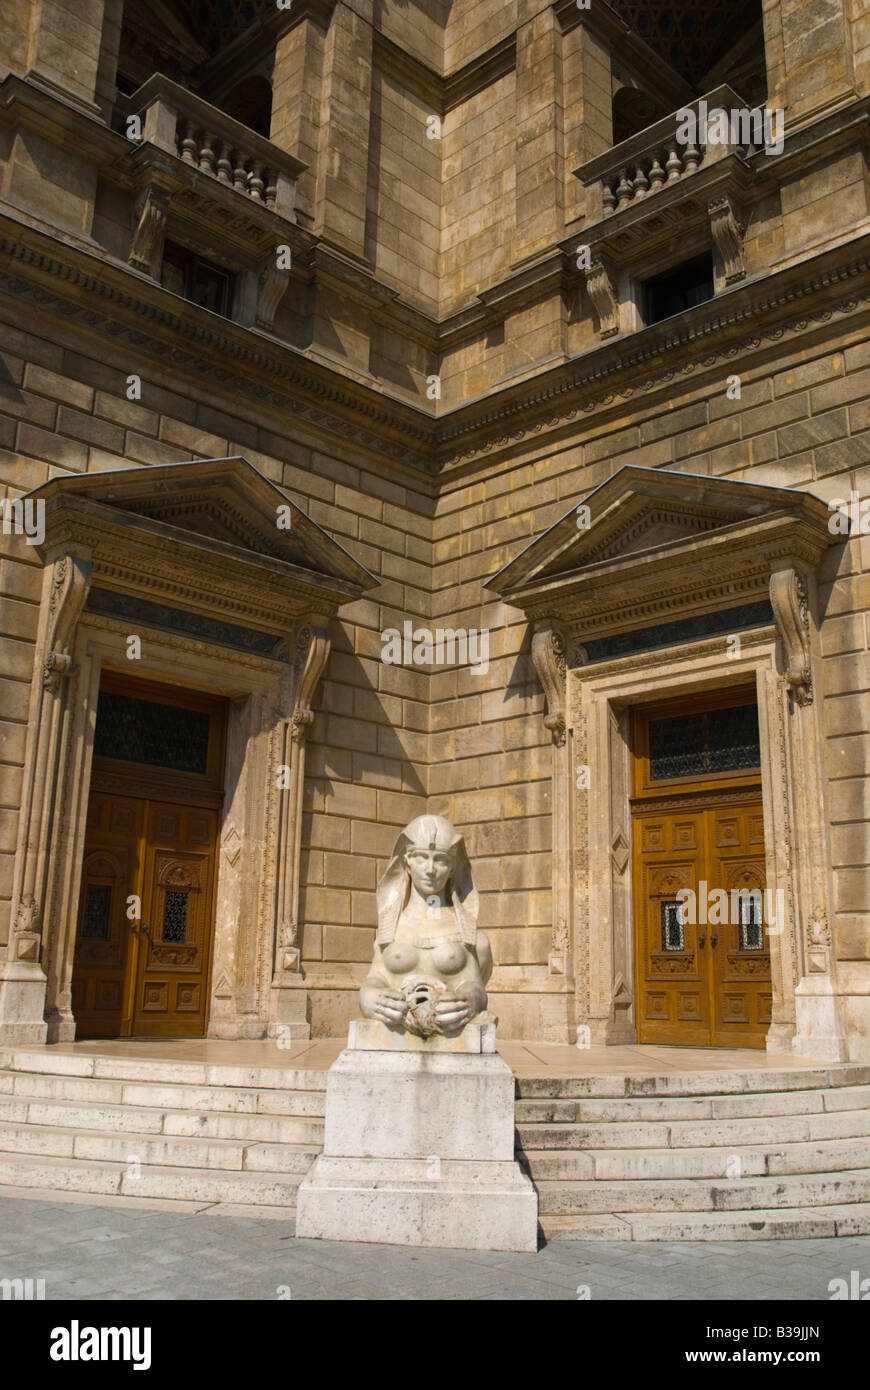 Statue outside Opera House on Andrassy boulevard in Budapest Hungary Europe - Stock Image